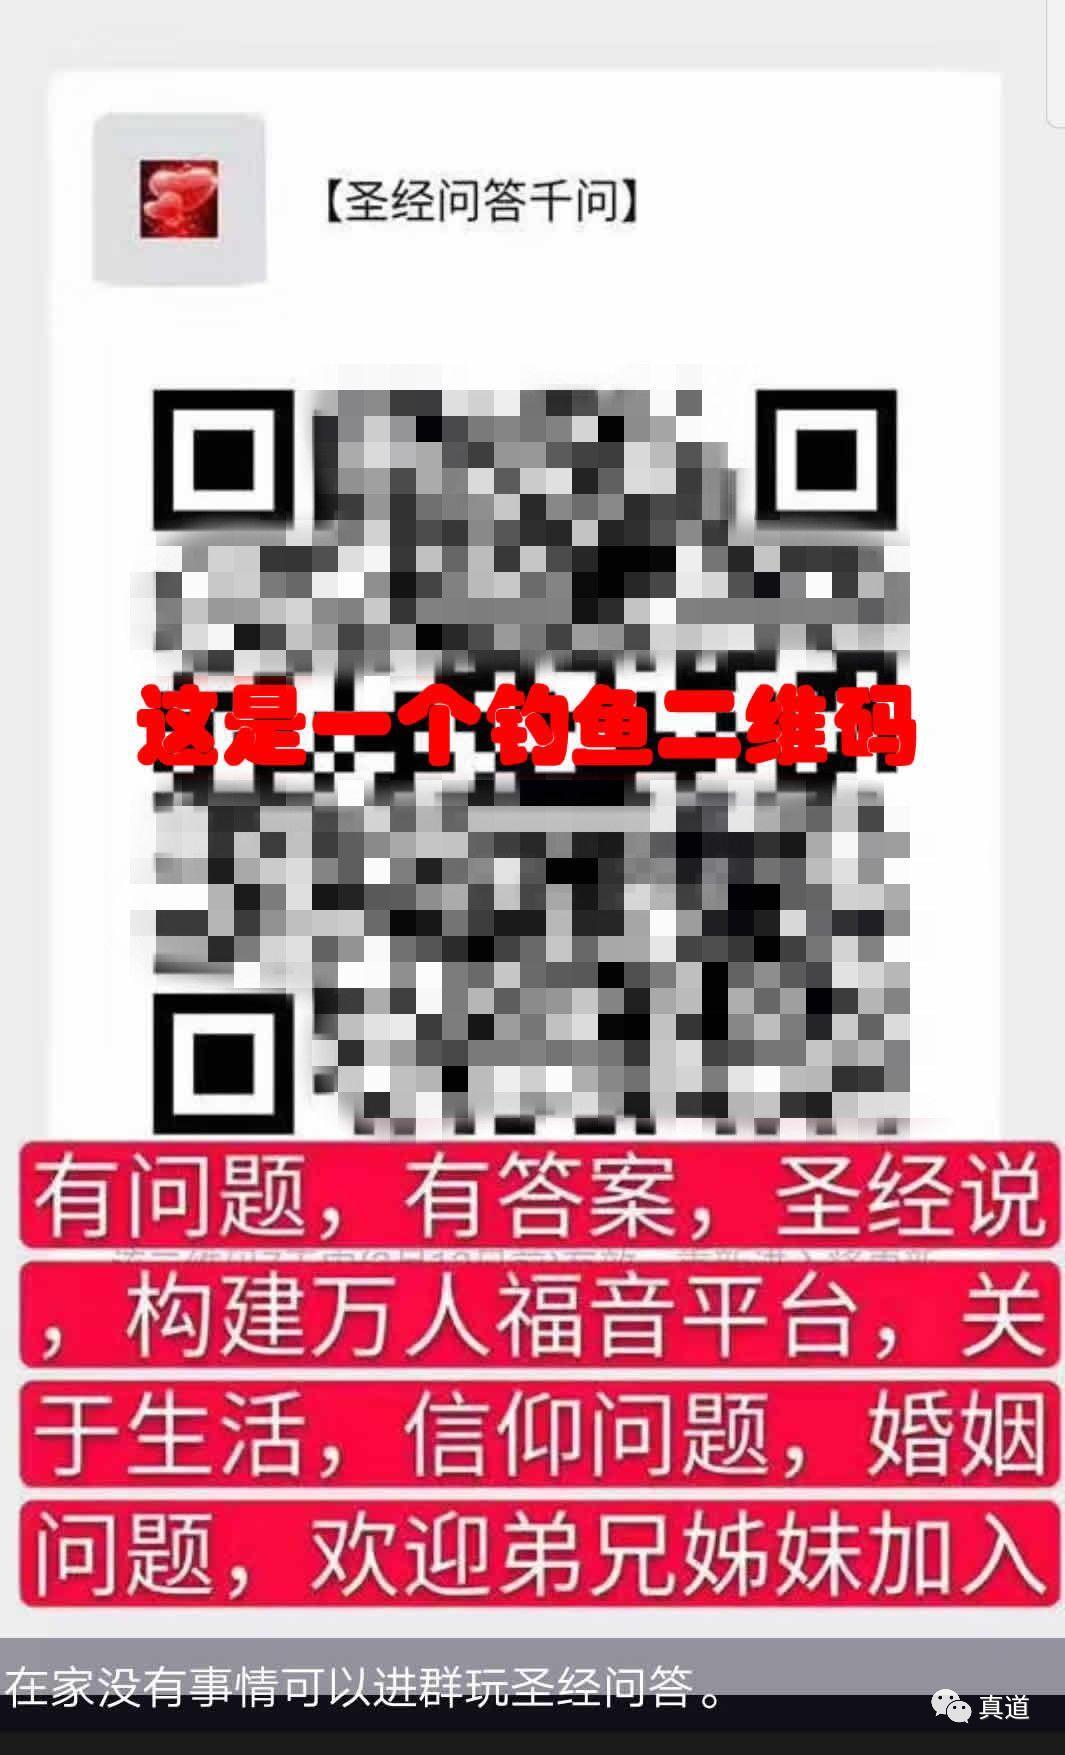 wxsync 13015654675e43abdb253a41581493211